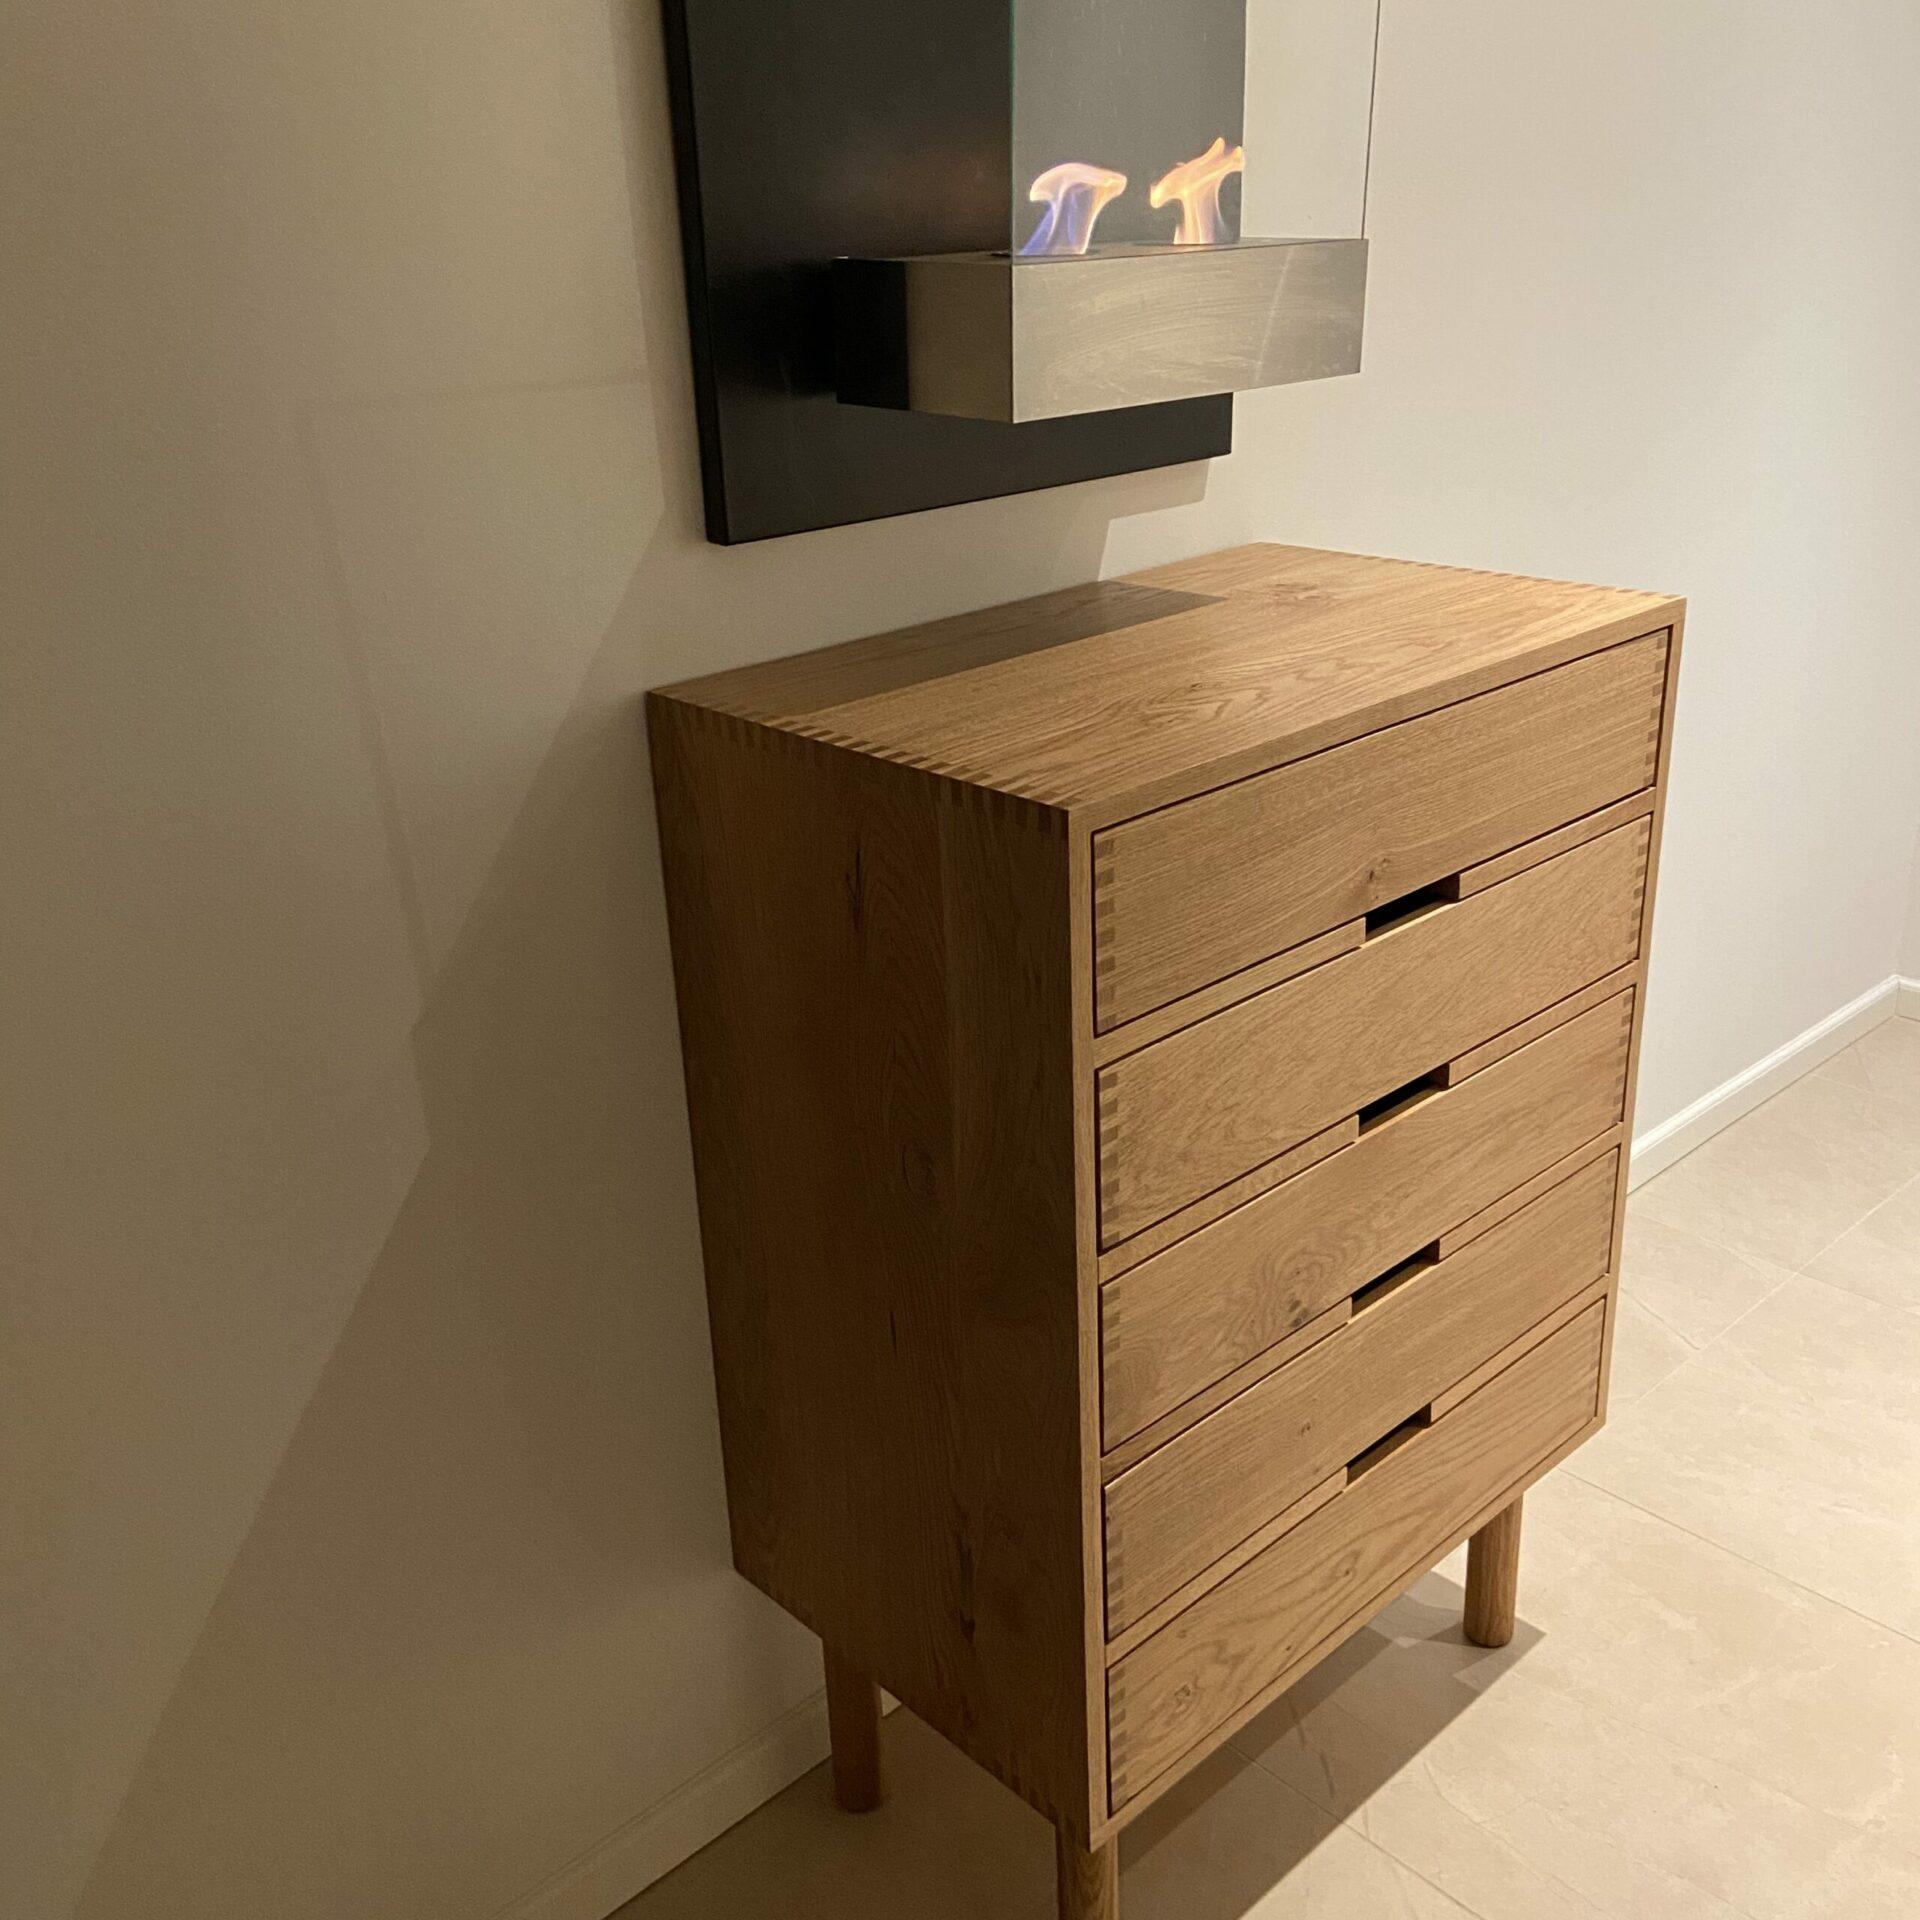 Sterr furniture designs